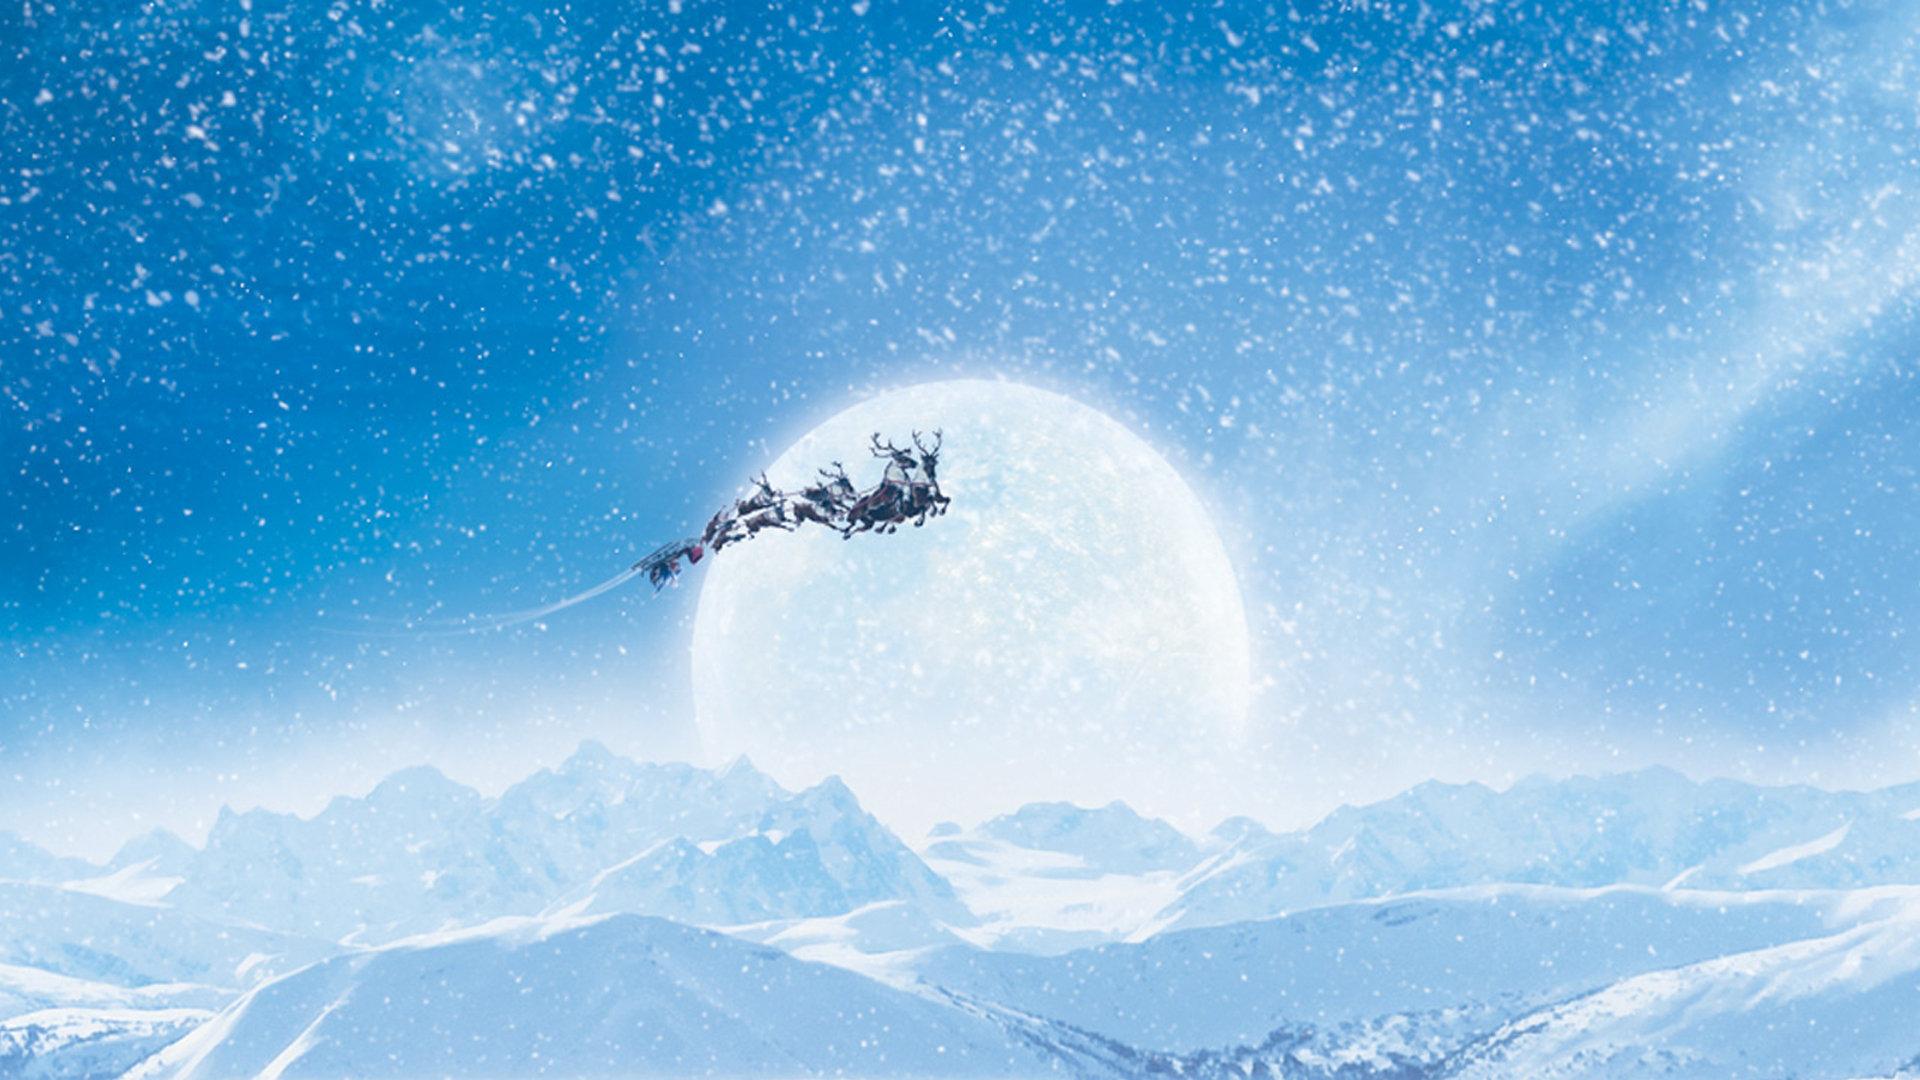 Free Santa Wallpaper 16180